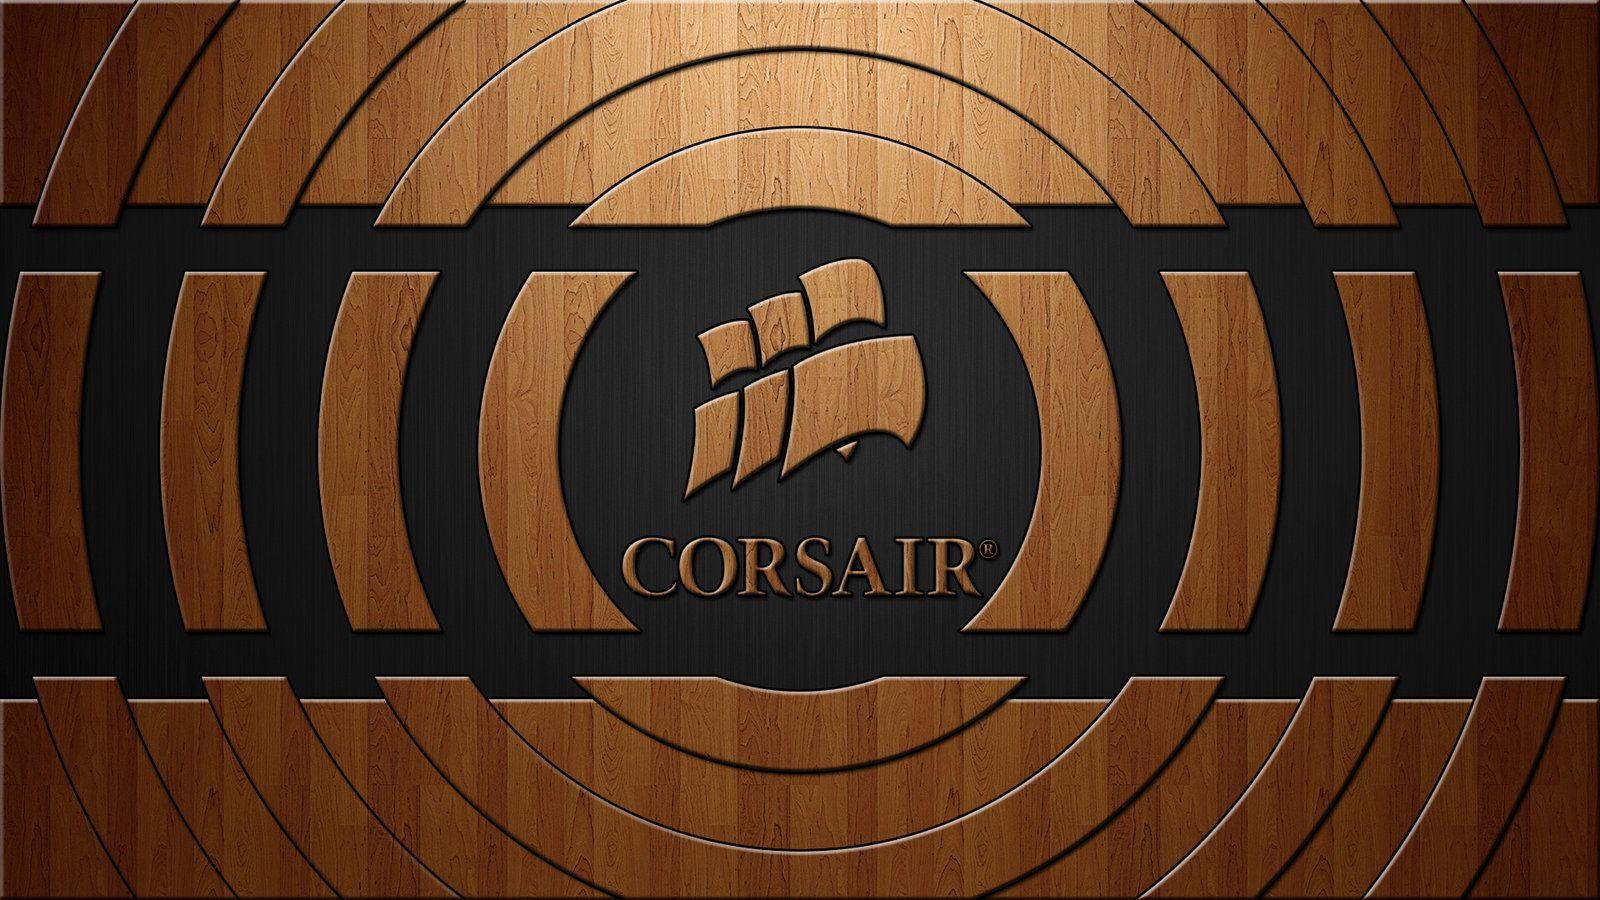 corsair wallpapers iphone